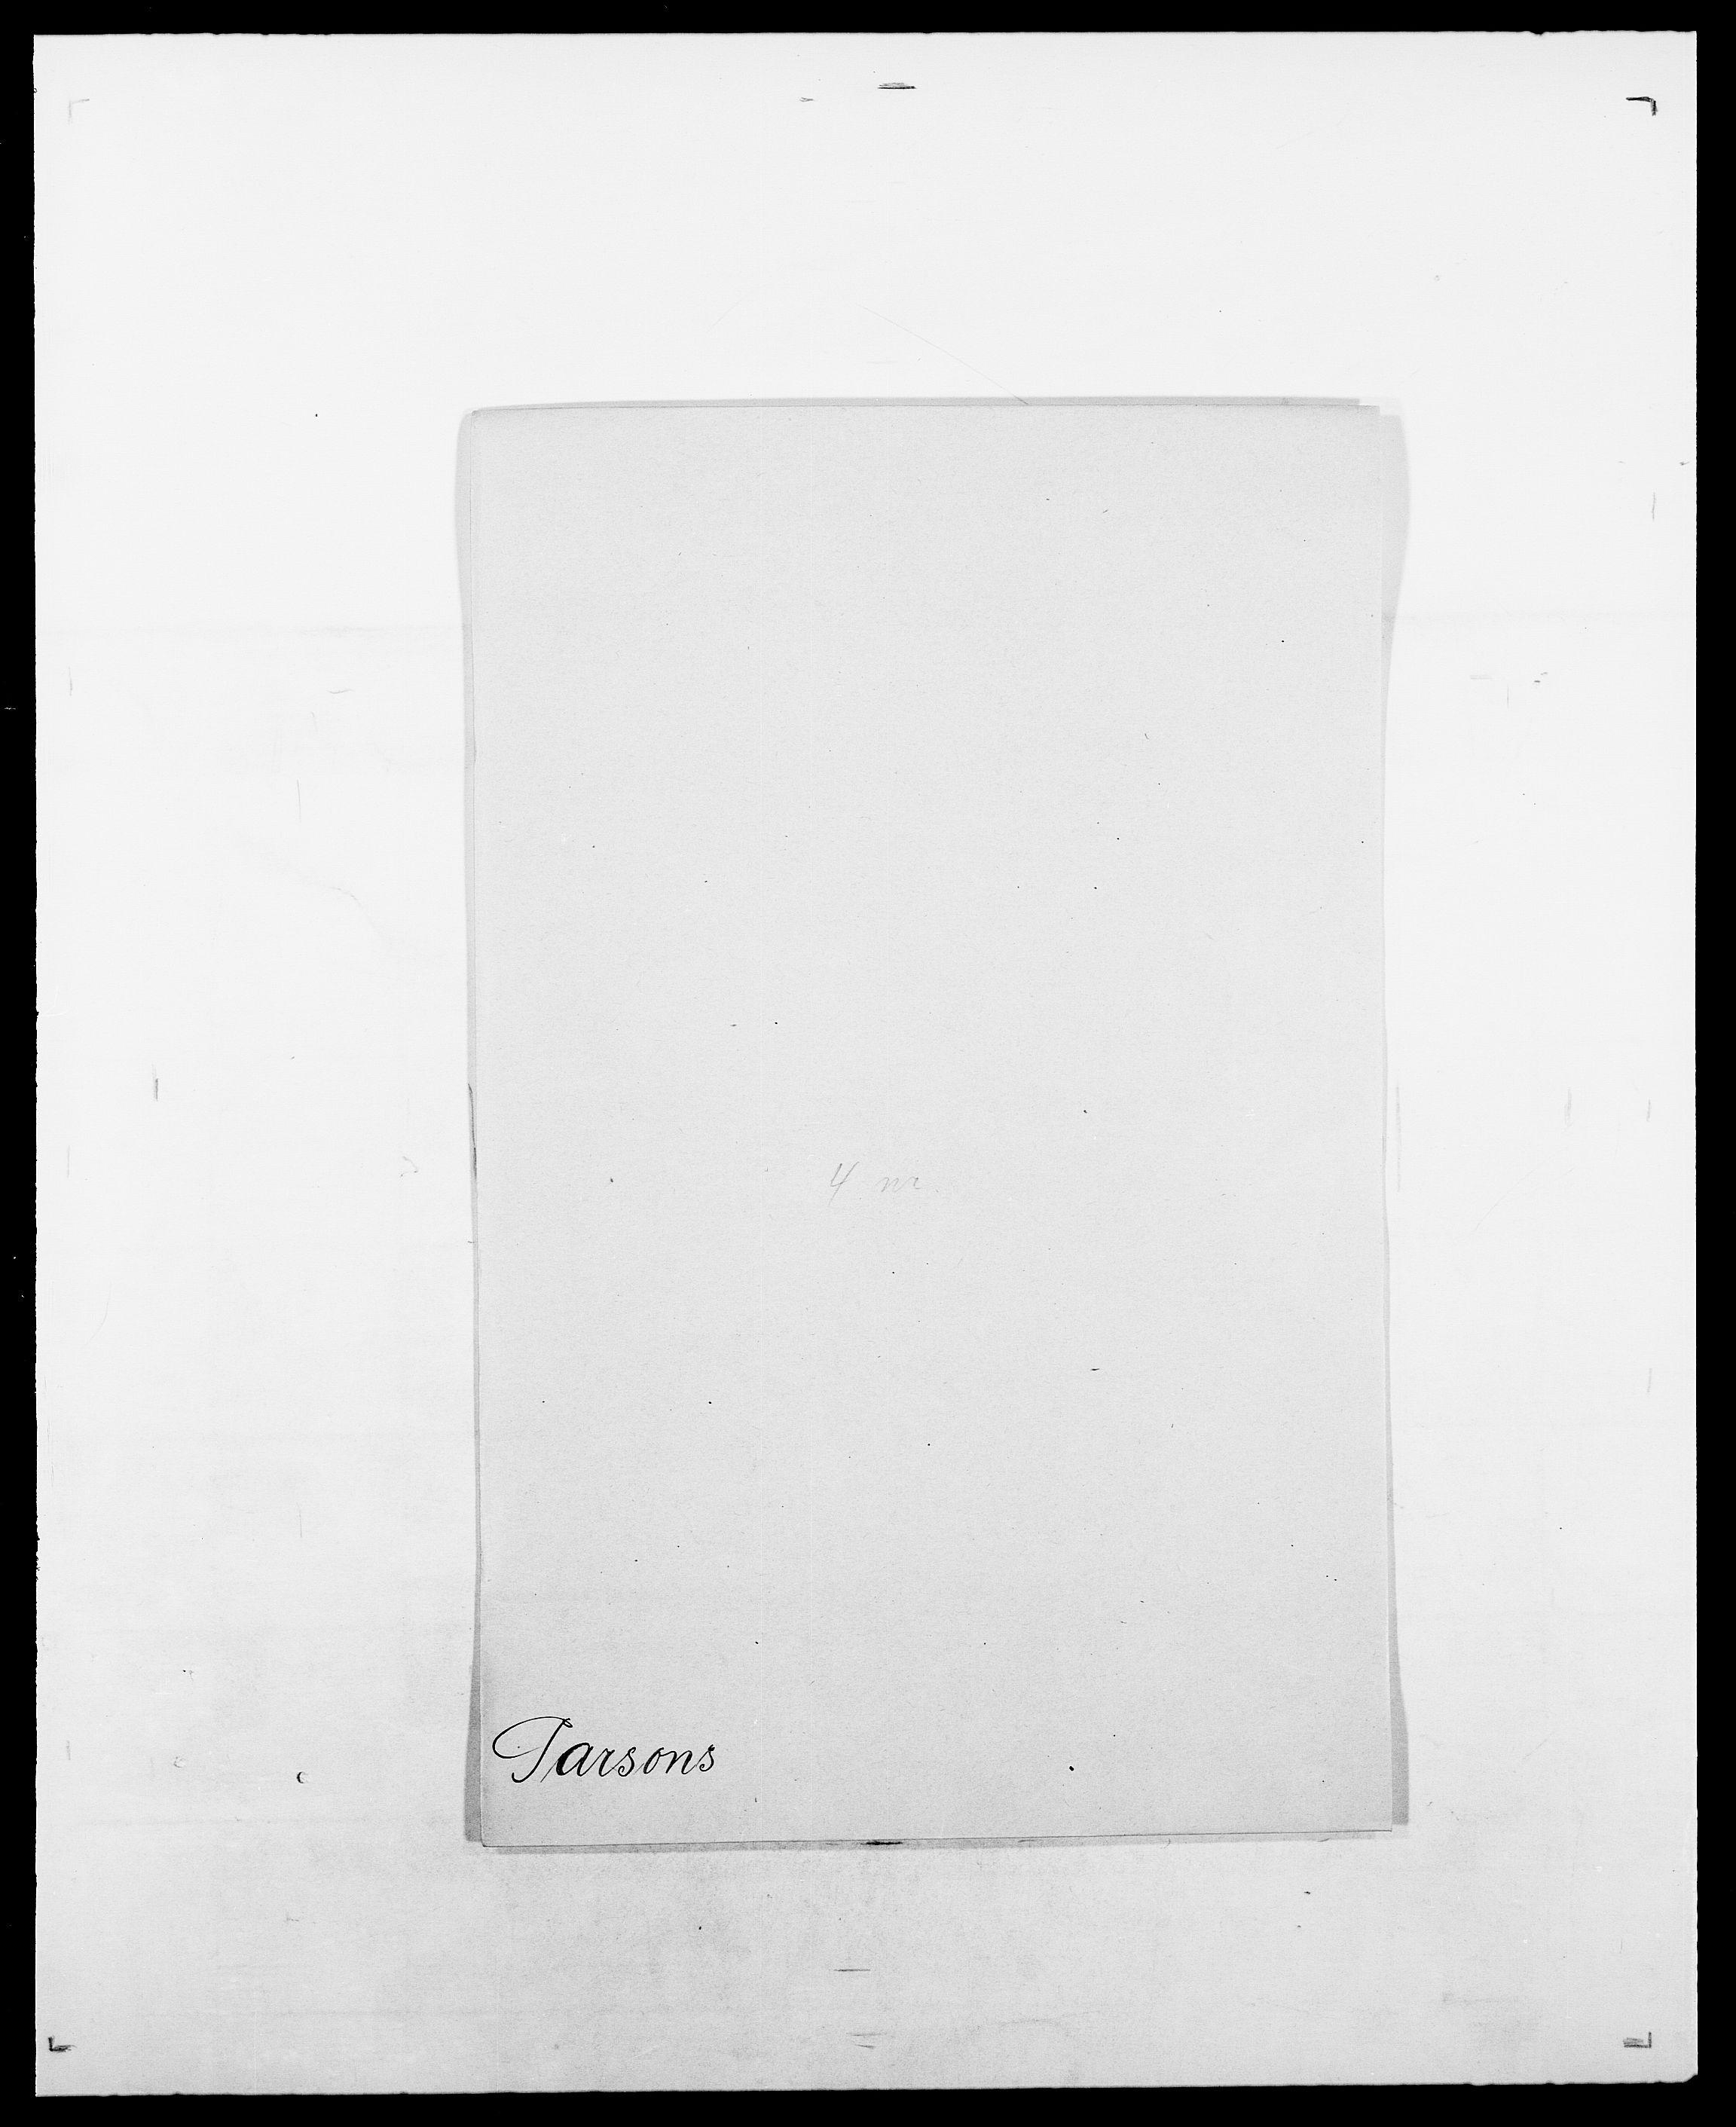 SAO, Delgobe, Charles Antoine - samling, D/Da/L0030: Paars - Pittelkov, s. 129